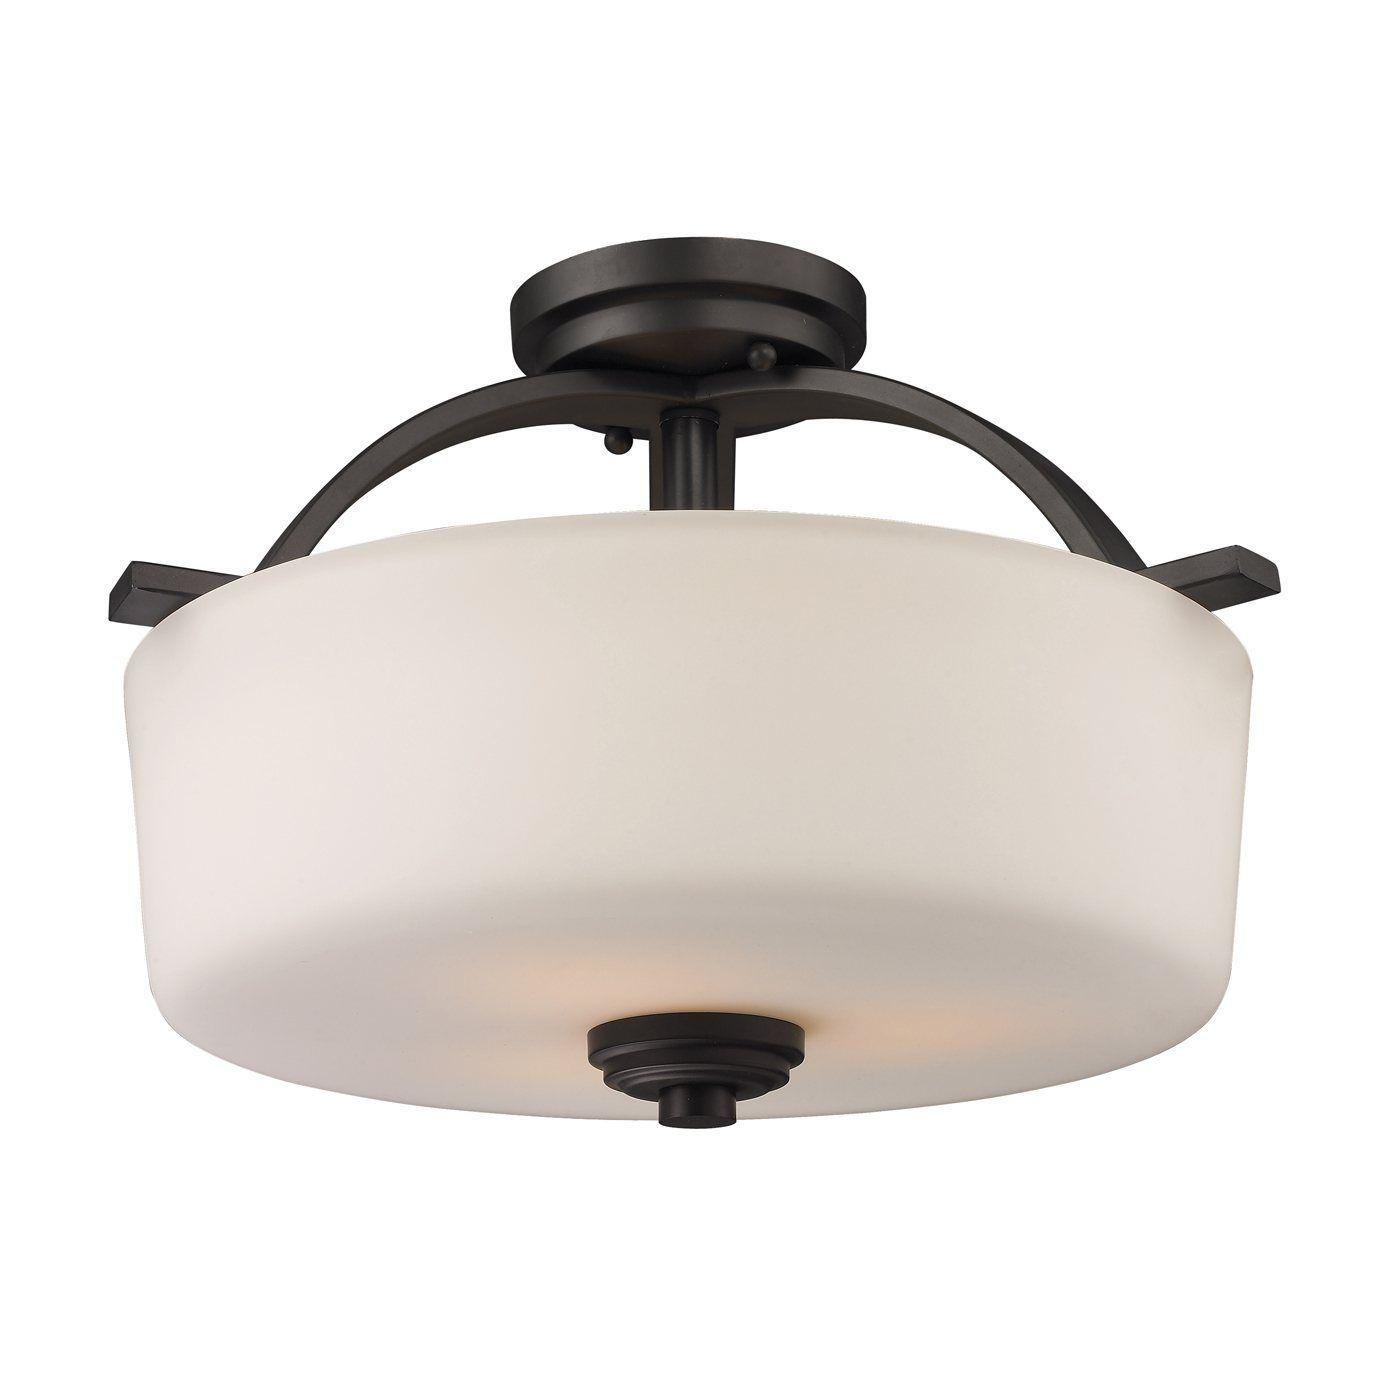 Lowes z lite 220sf 3 light arlington semi flush mount ceiling light lowes canada 184